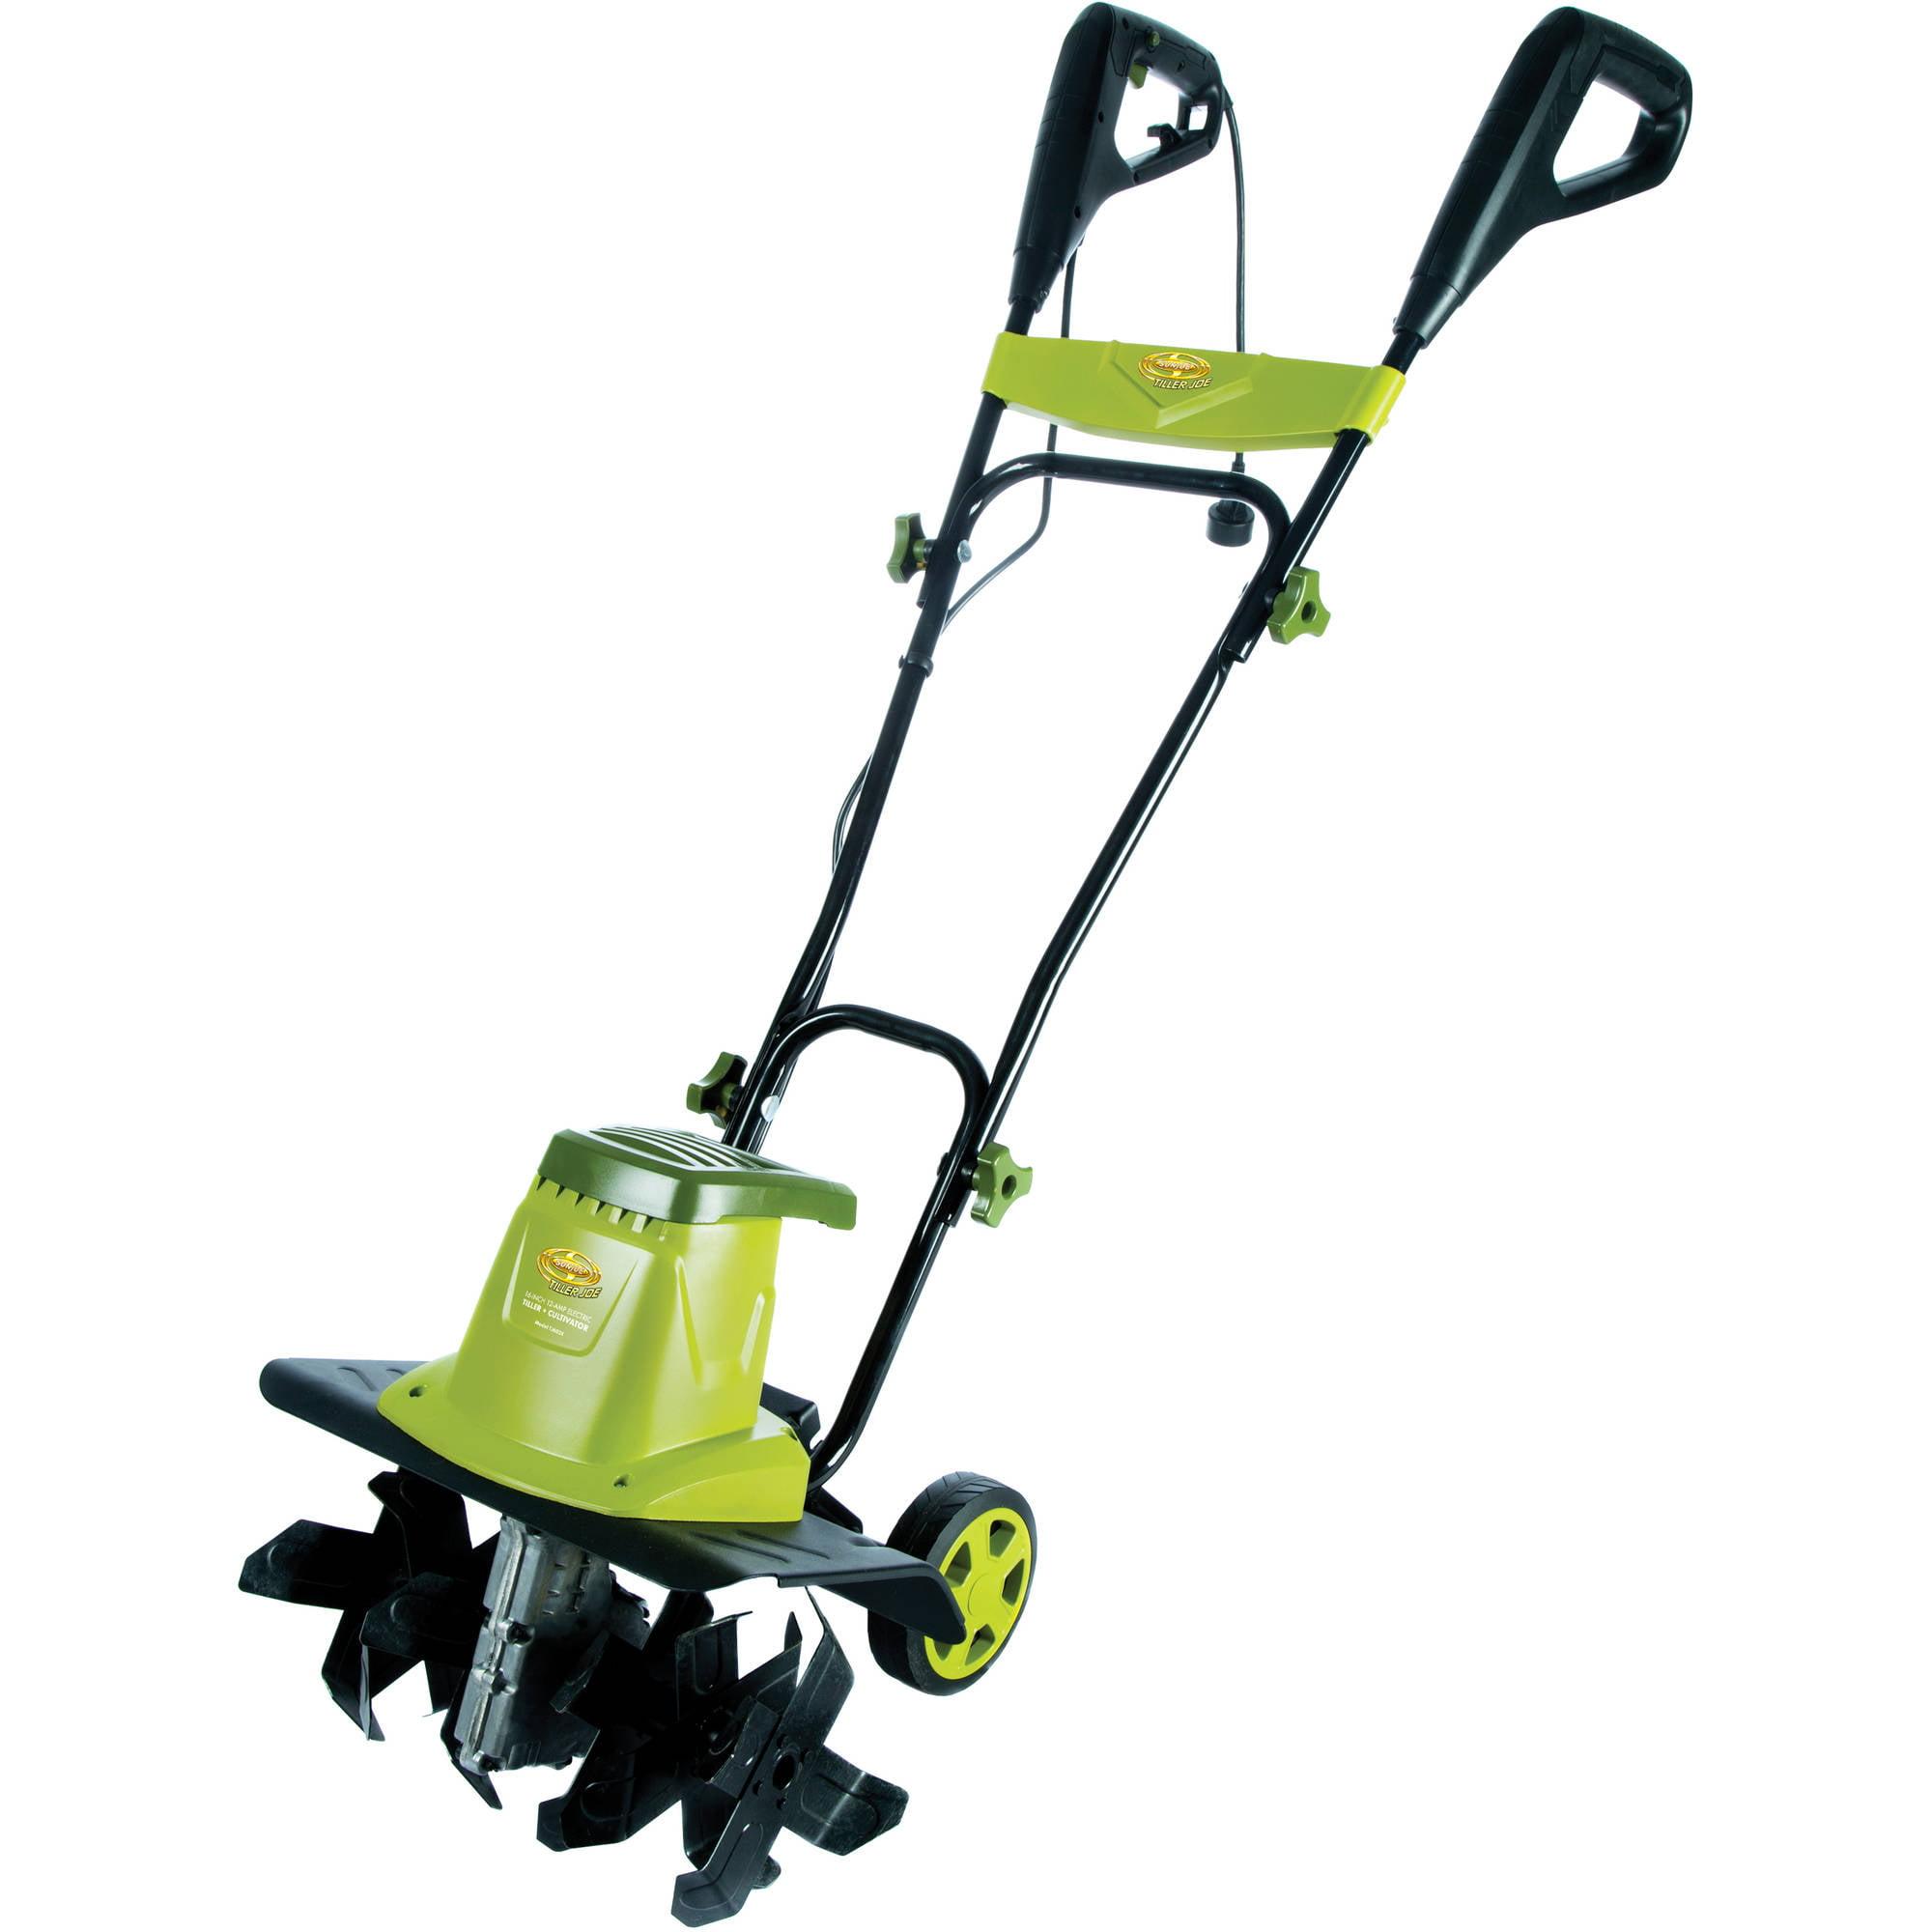 "Sun Joe Tiller Joe 16"" 12-Amp Electric Garden Tiller/Cultivator – TJ603E"